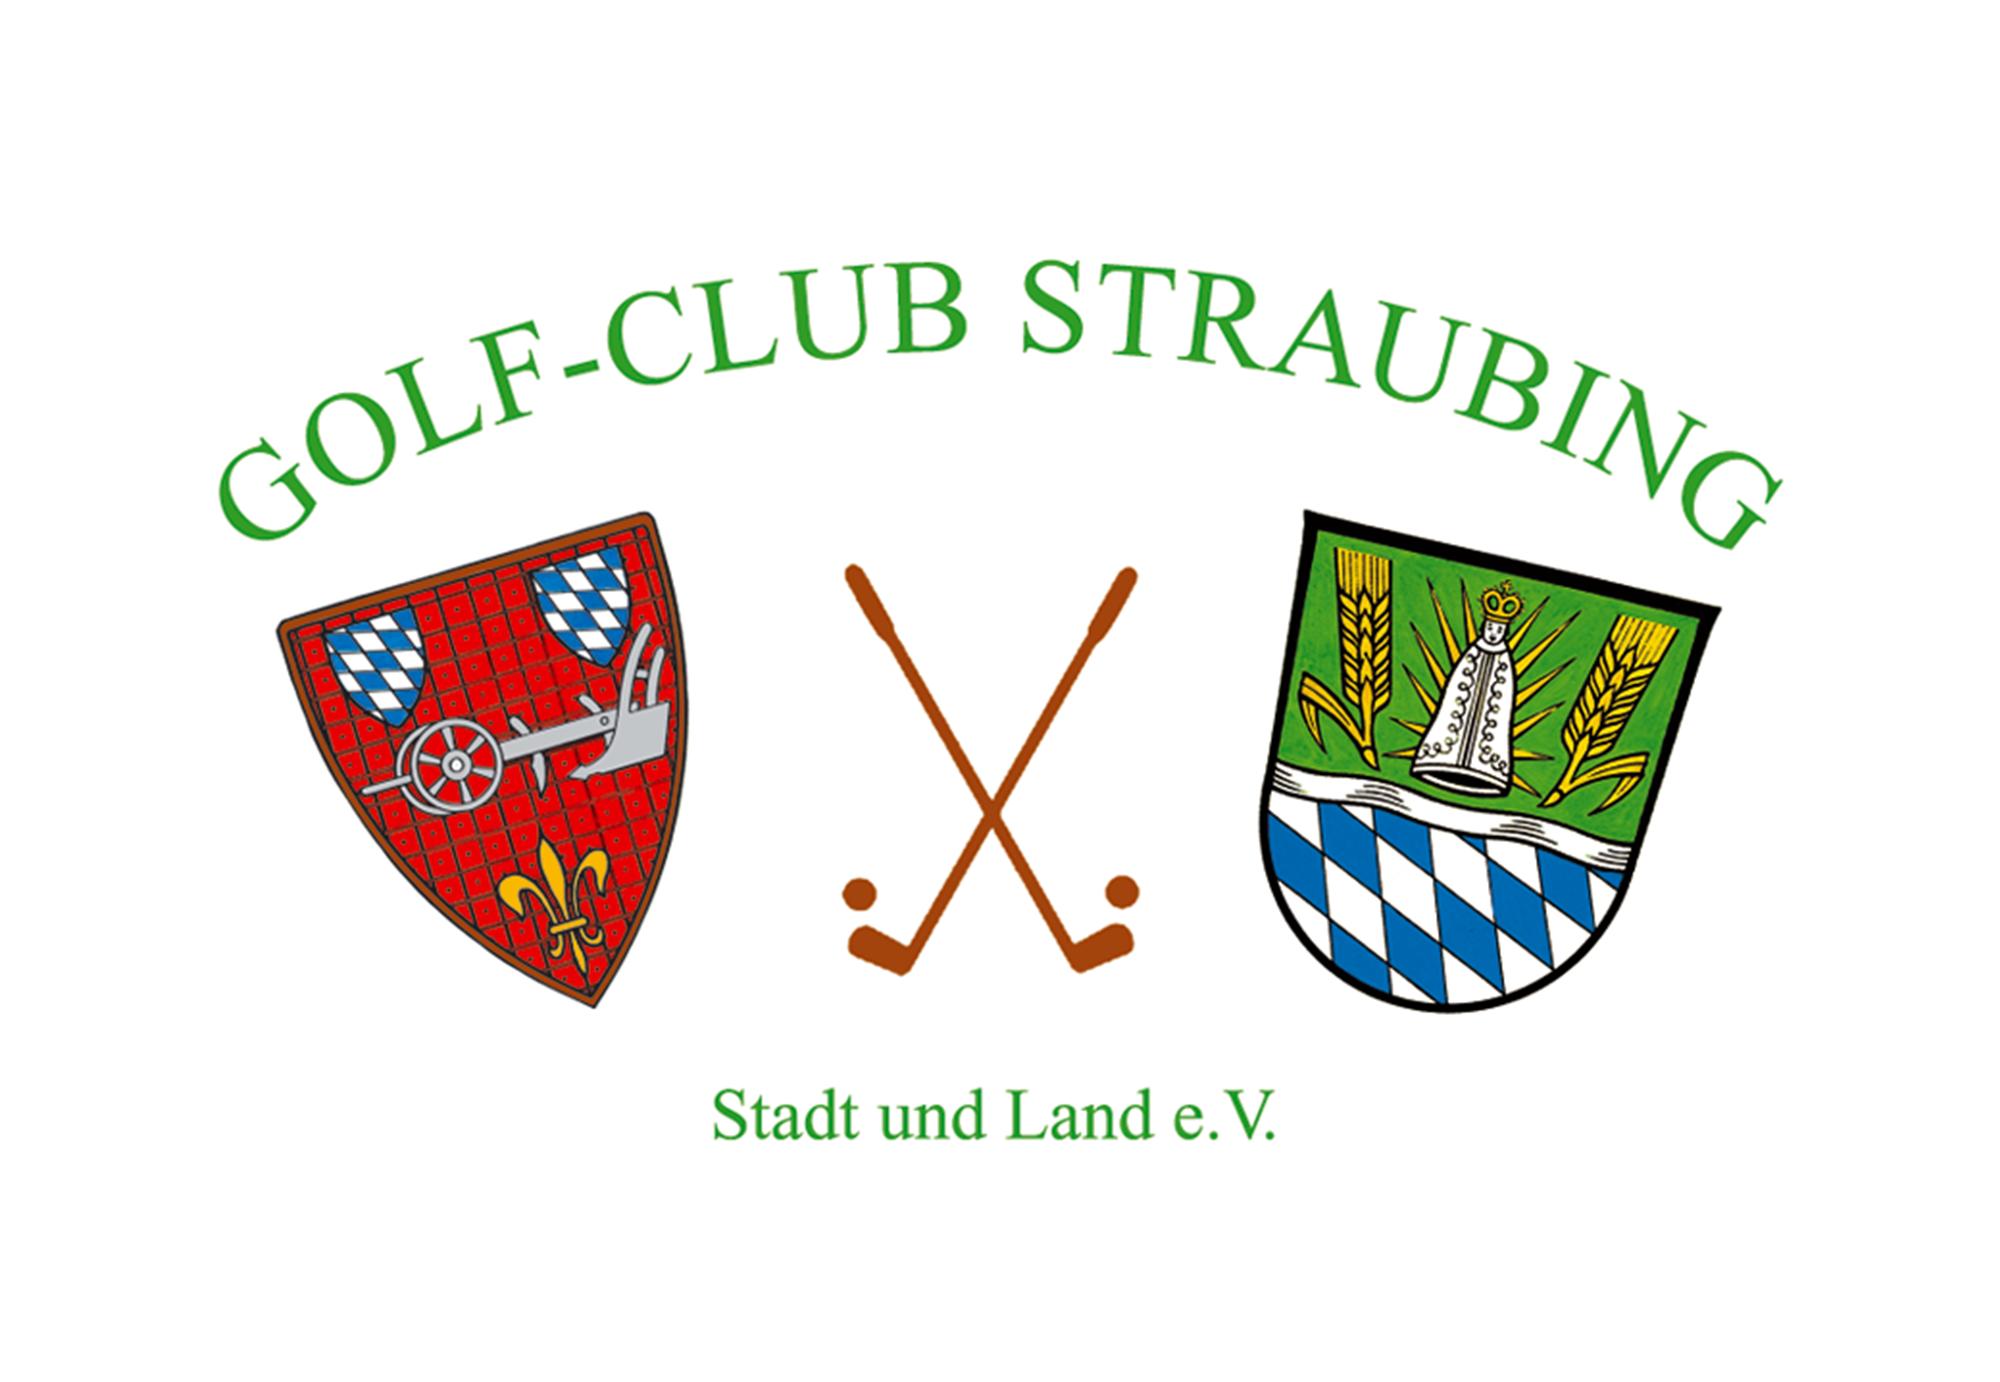 Logo Golfclub Straubing Stadt und Land e.V.